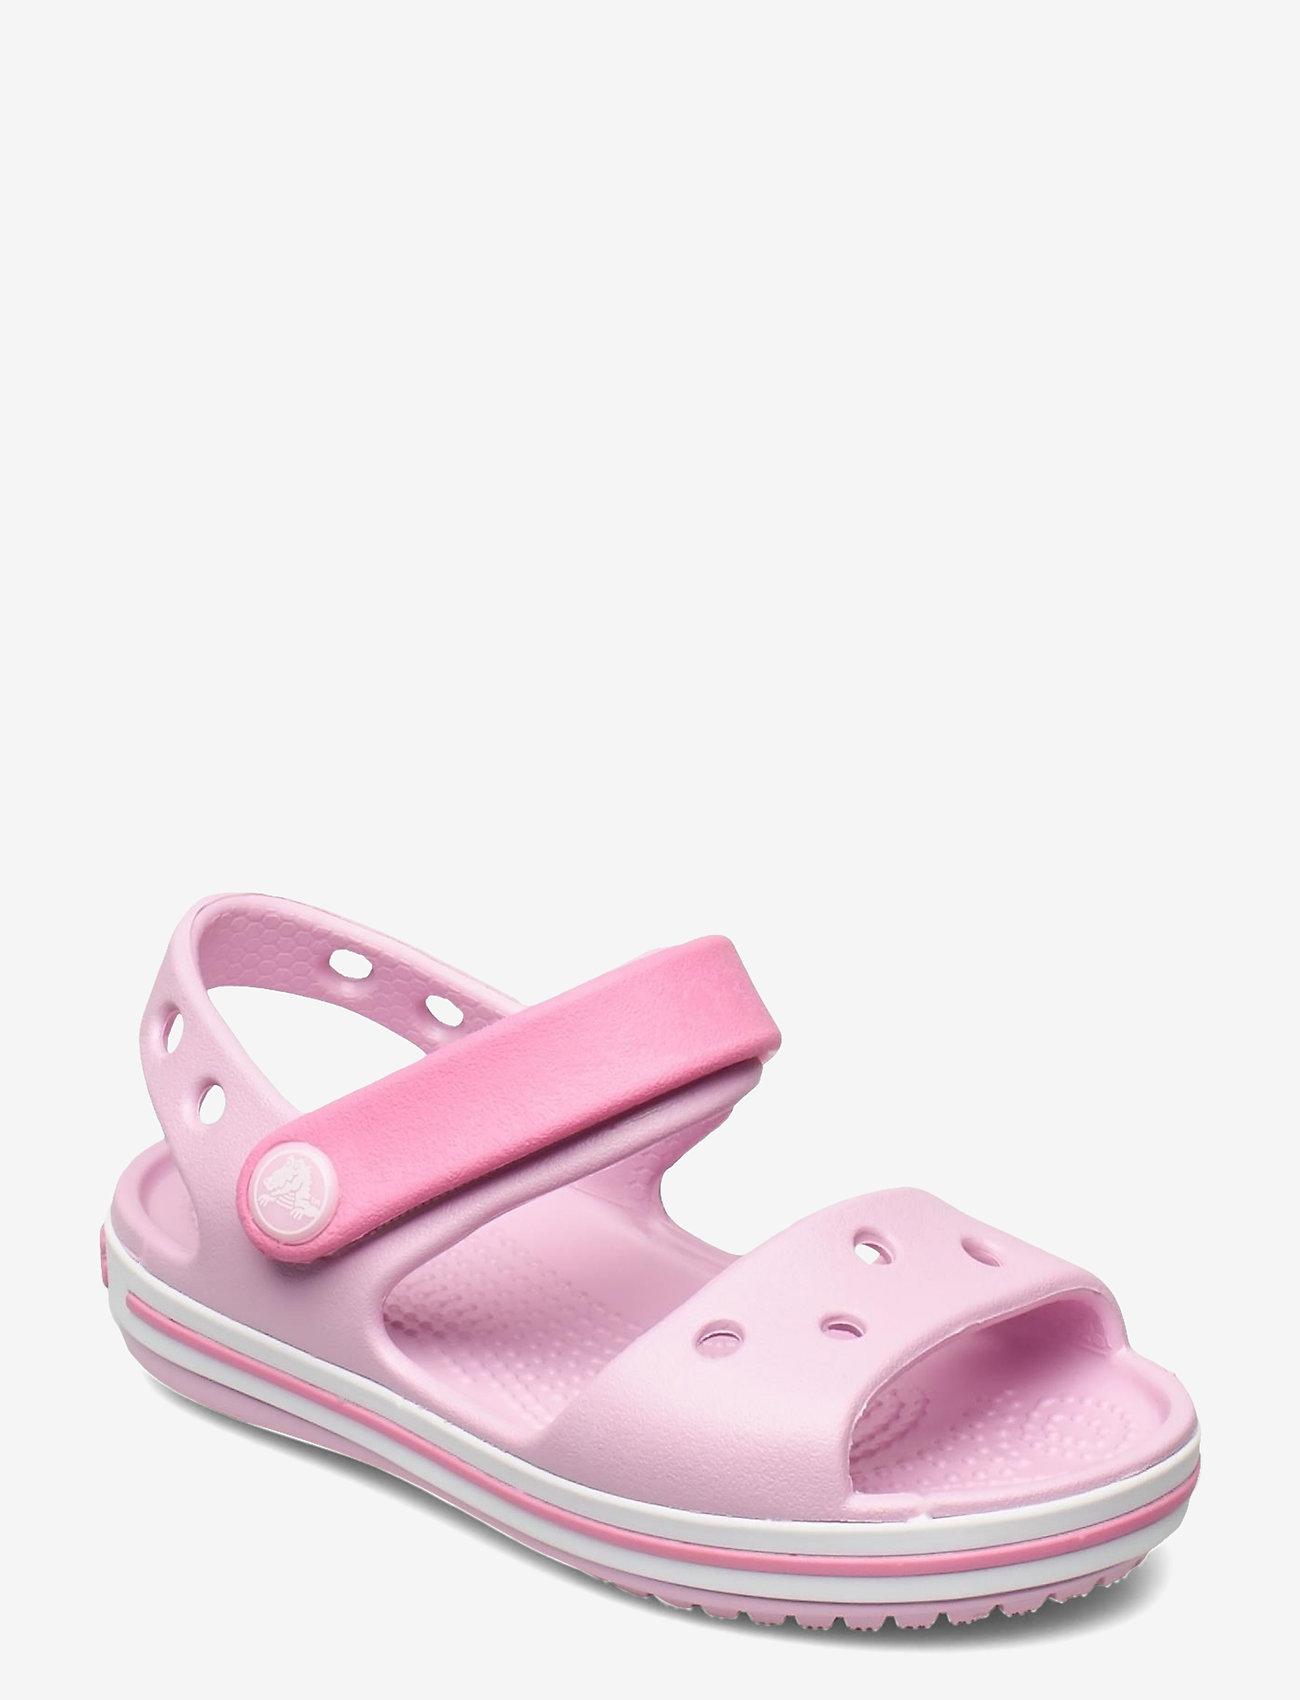 Crocs - Crocband Sandal Kids - ballerina pink - 0